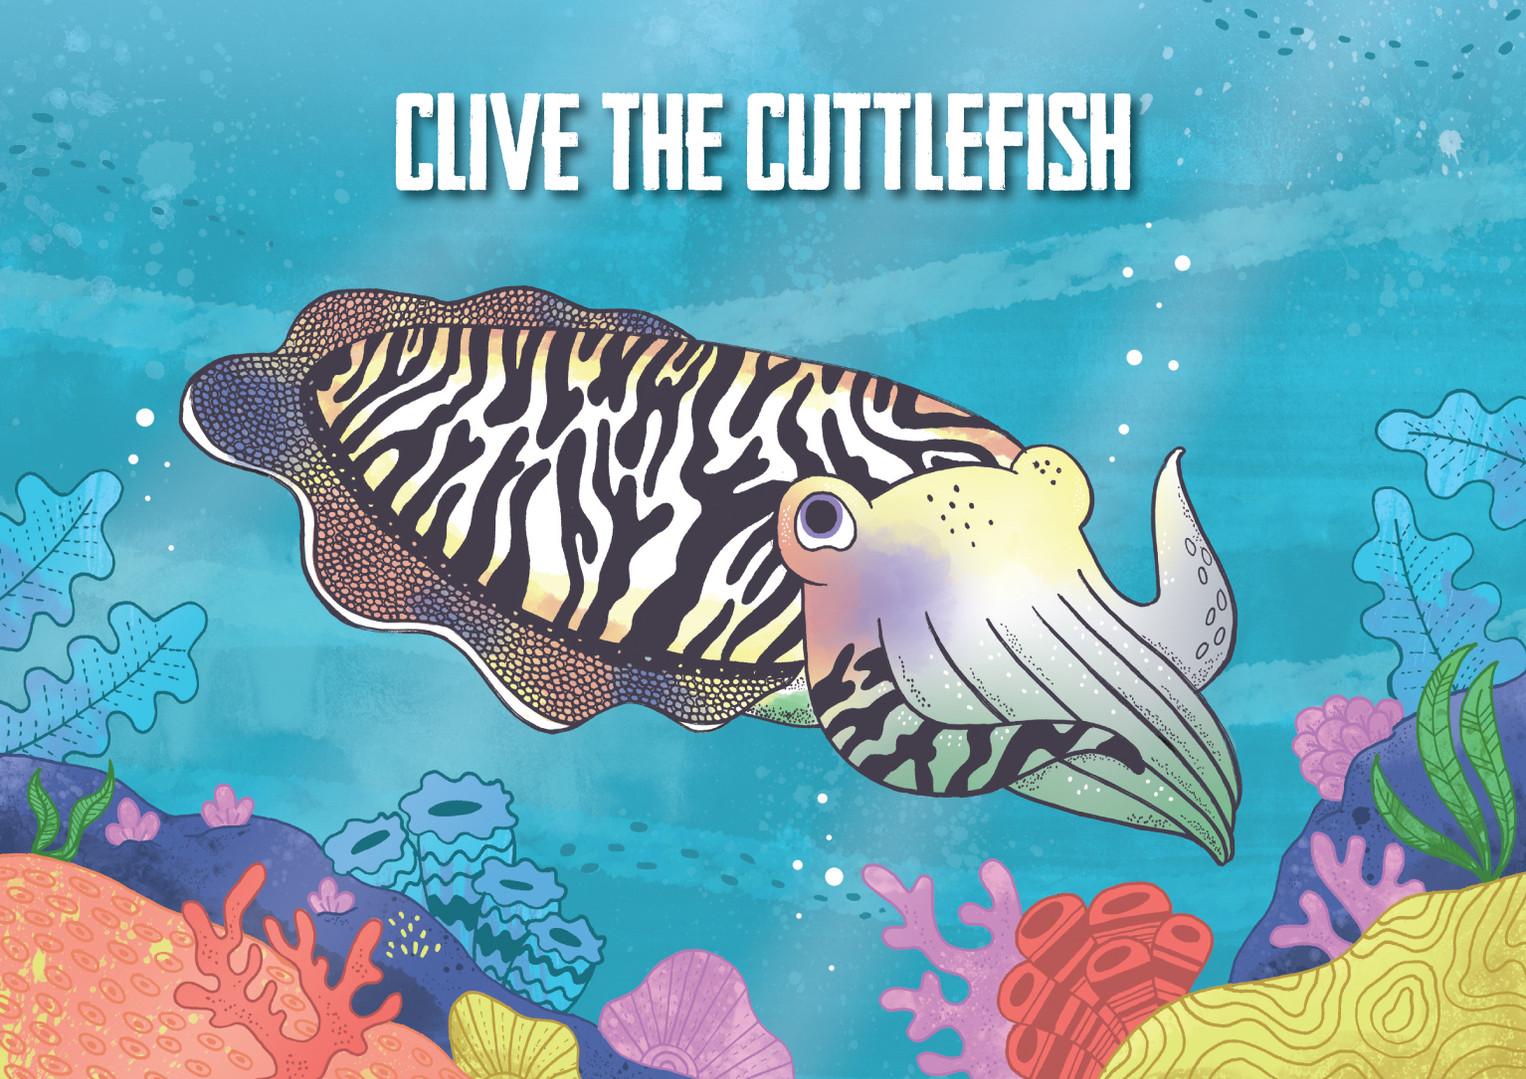 Clive the Cuttlefish cvr.jpg